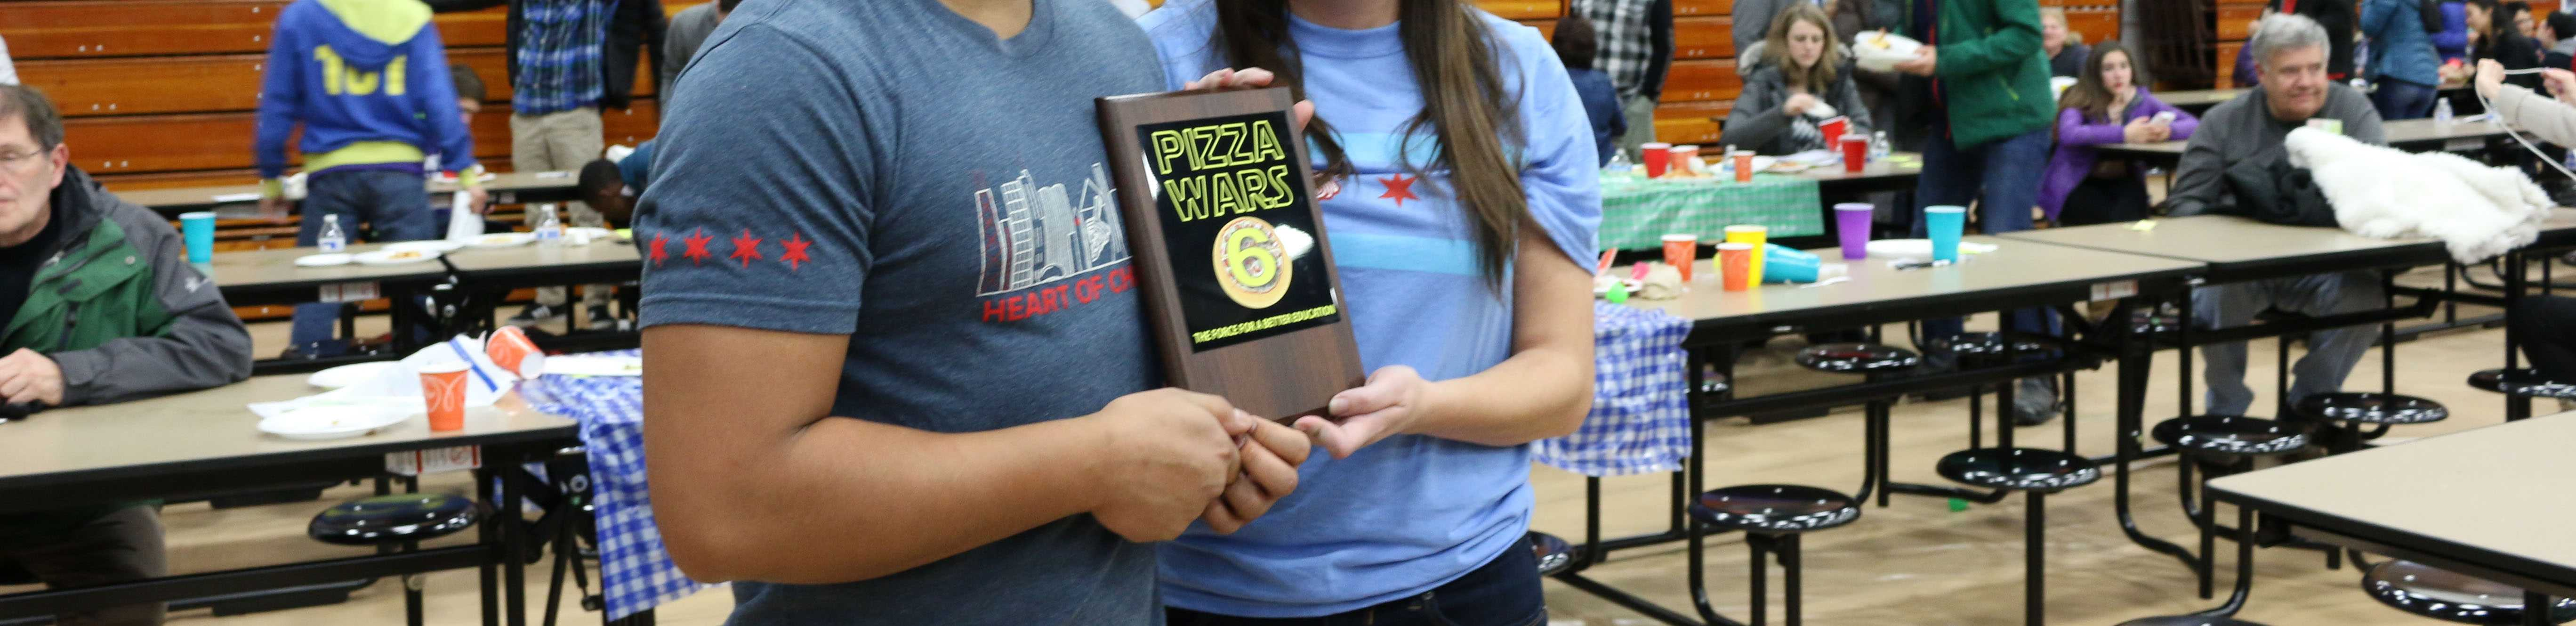 Pizza Wars: The Cheese Awakens